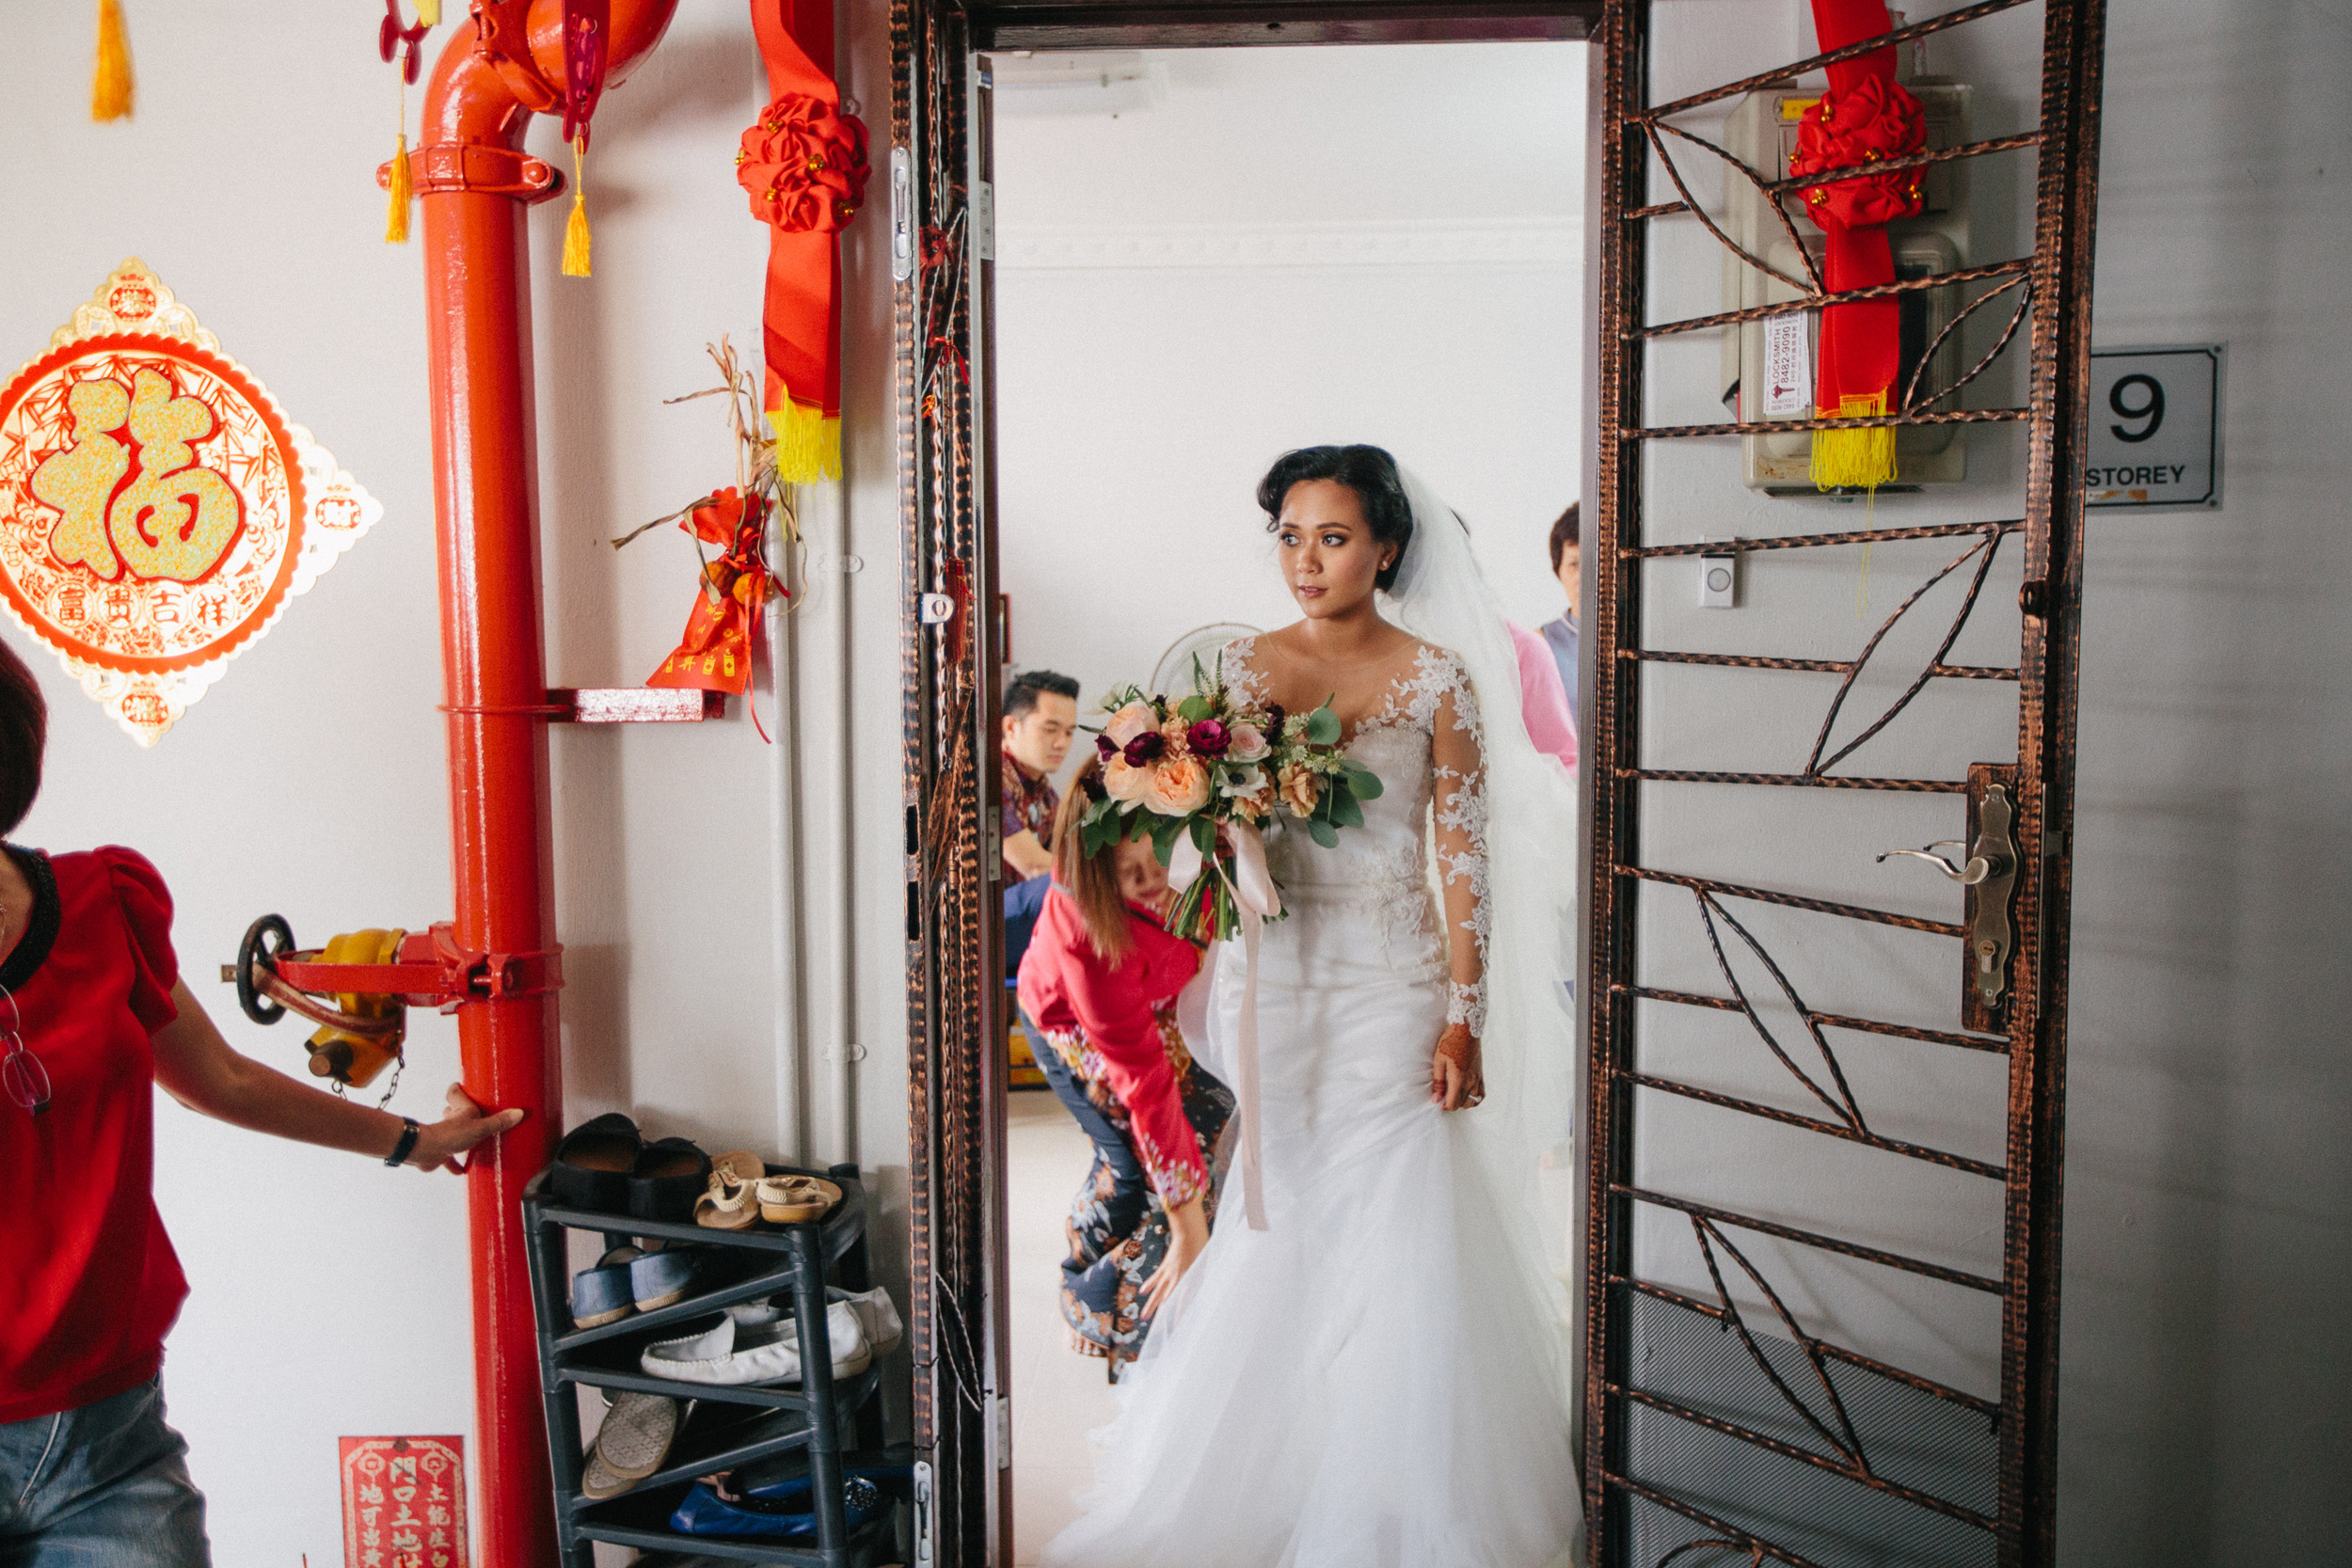 singapore-wedding-photographer-photography-wmt2017-031.jpg